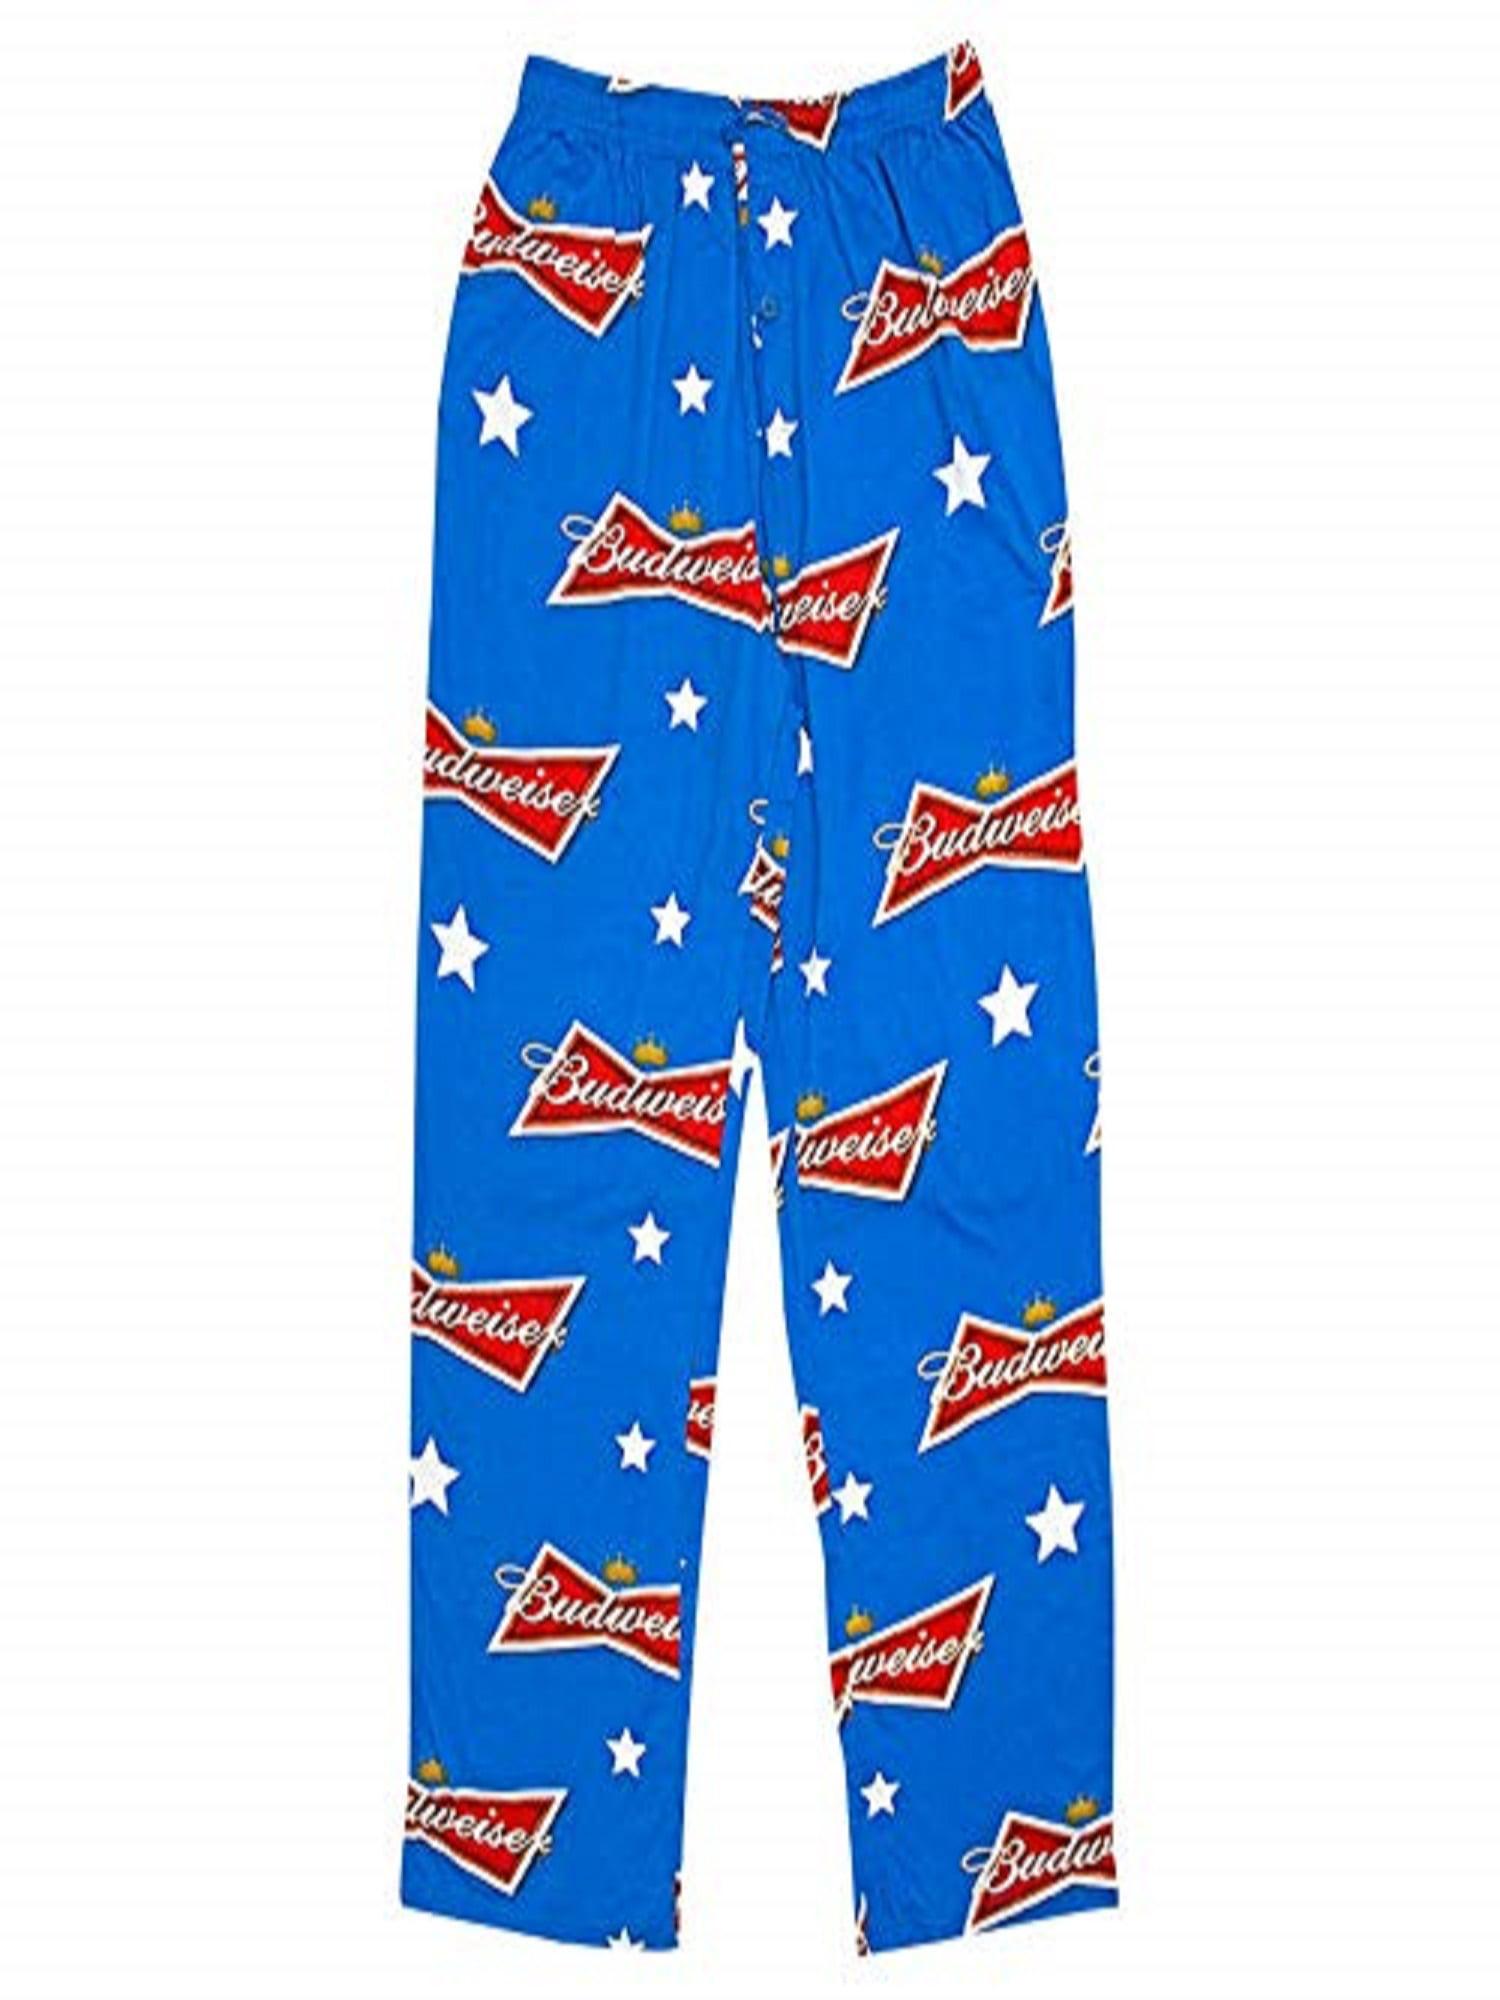 Men/'s Budweiser Pajamas Pants Fleece Novelty Sleep Wear Beer Party Attire Blue